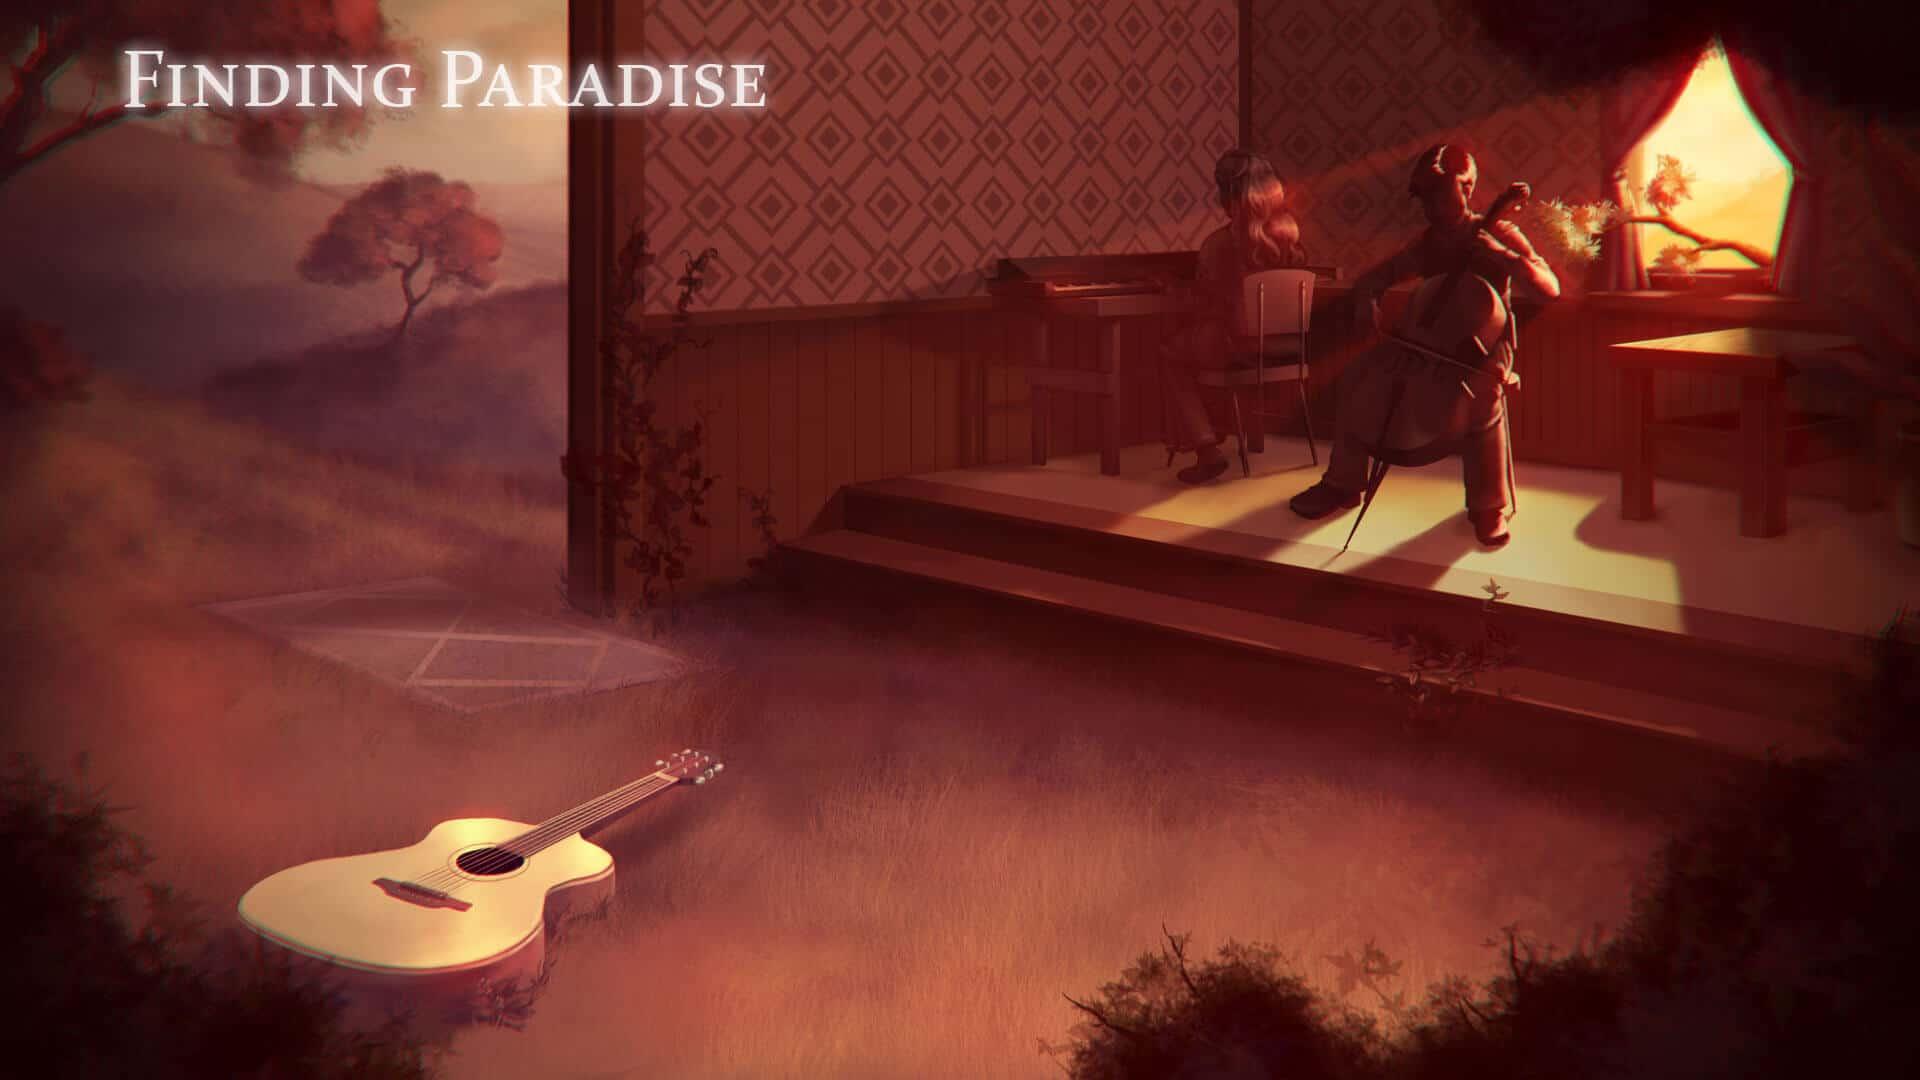 Finding Paradise Wallpaper